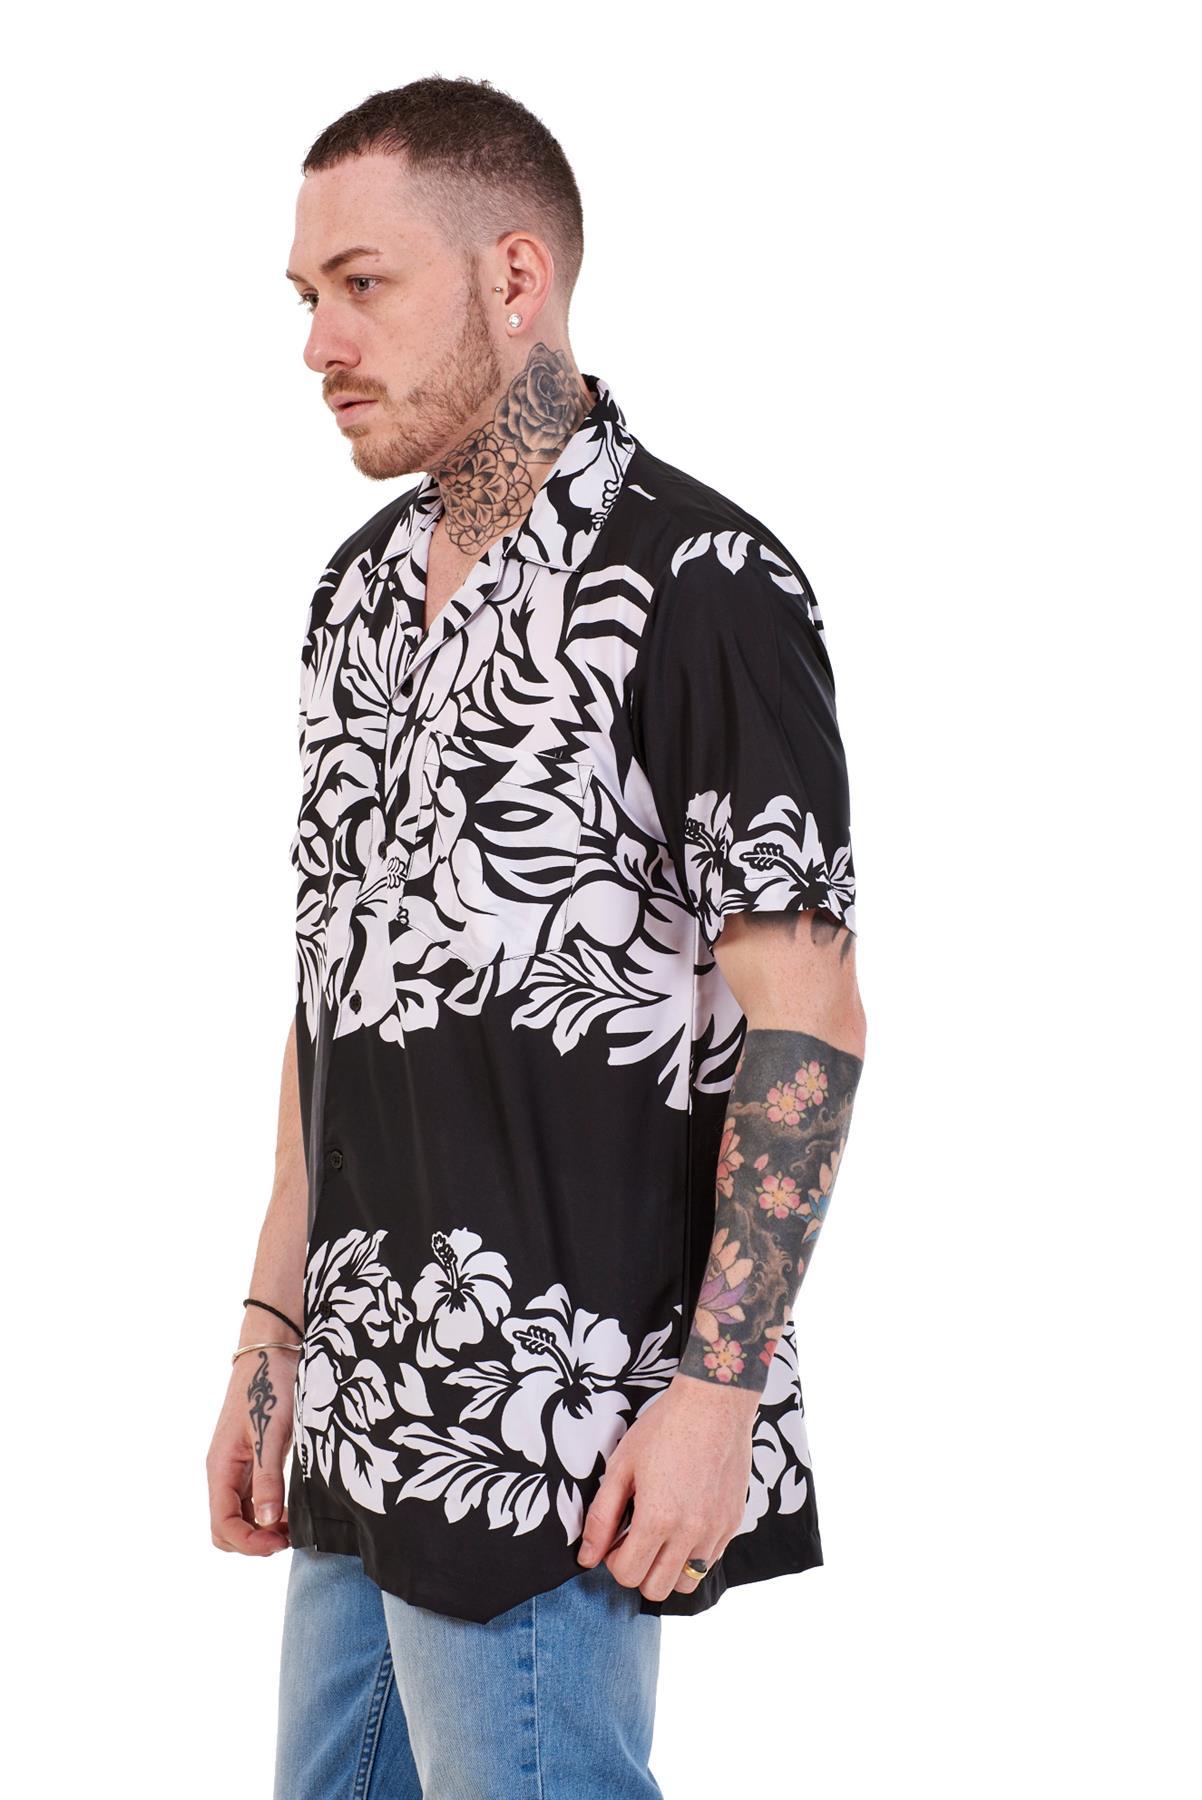 Mens-Hawaiian-Shirt-Multi-Colors-Print-Regular-Big-Size-Summer-Fancy-Dress-M-5XL thumbnail 4